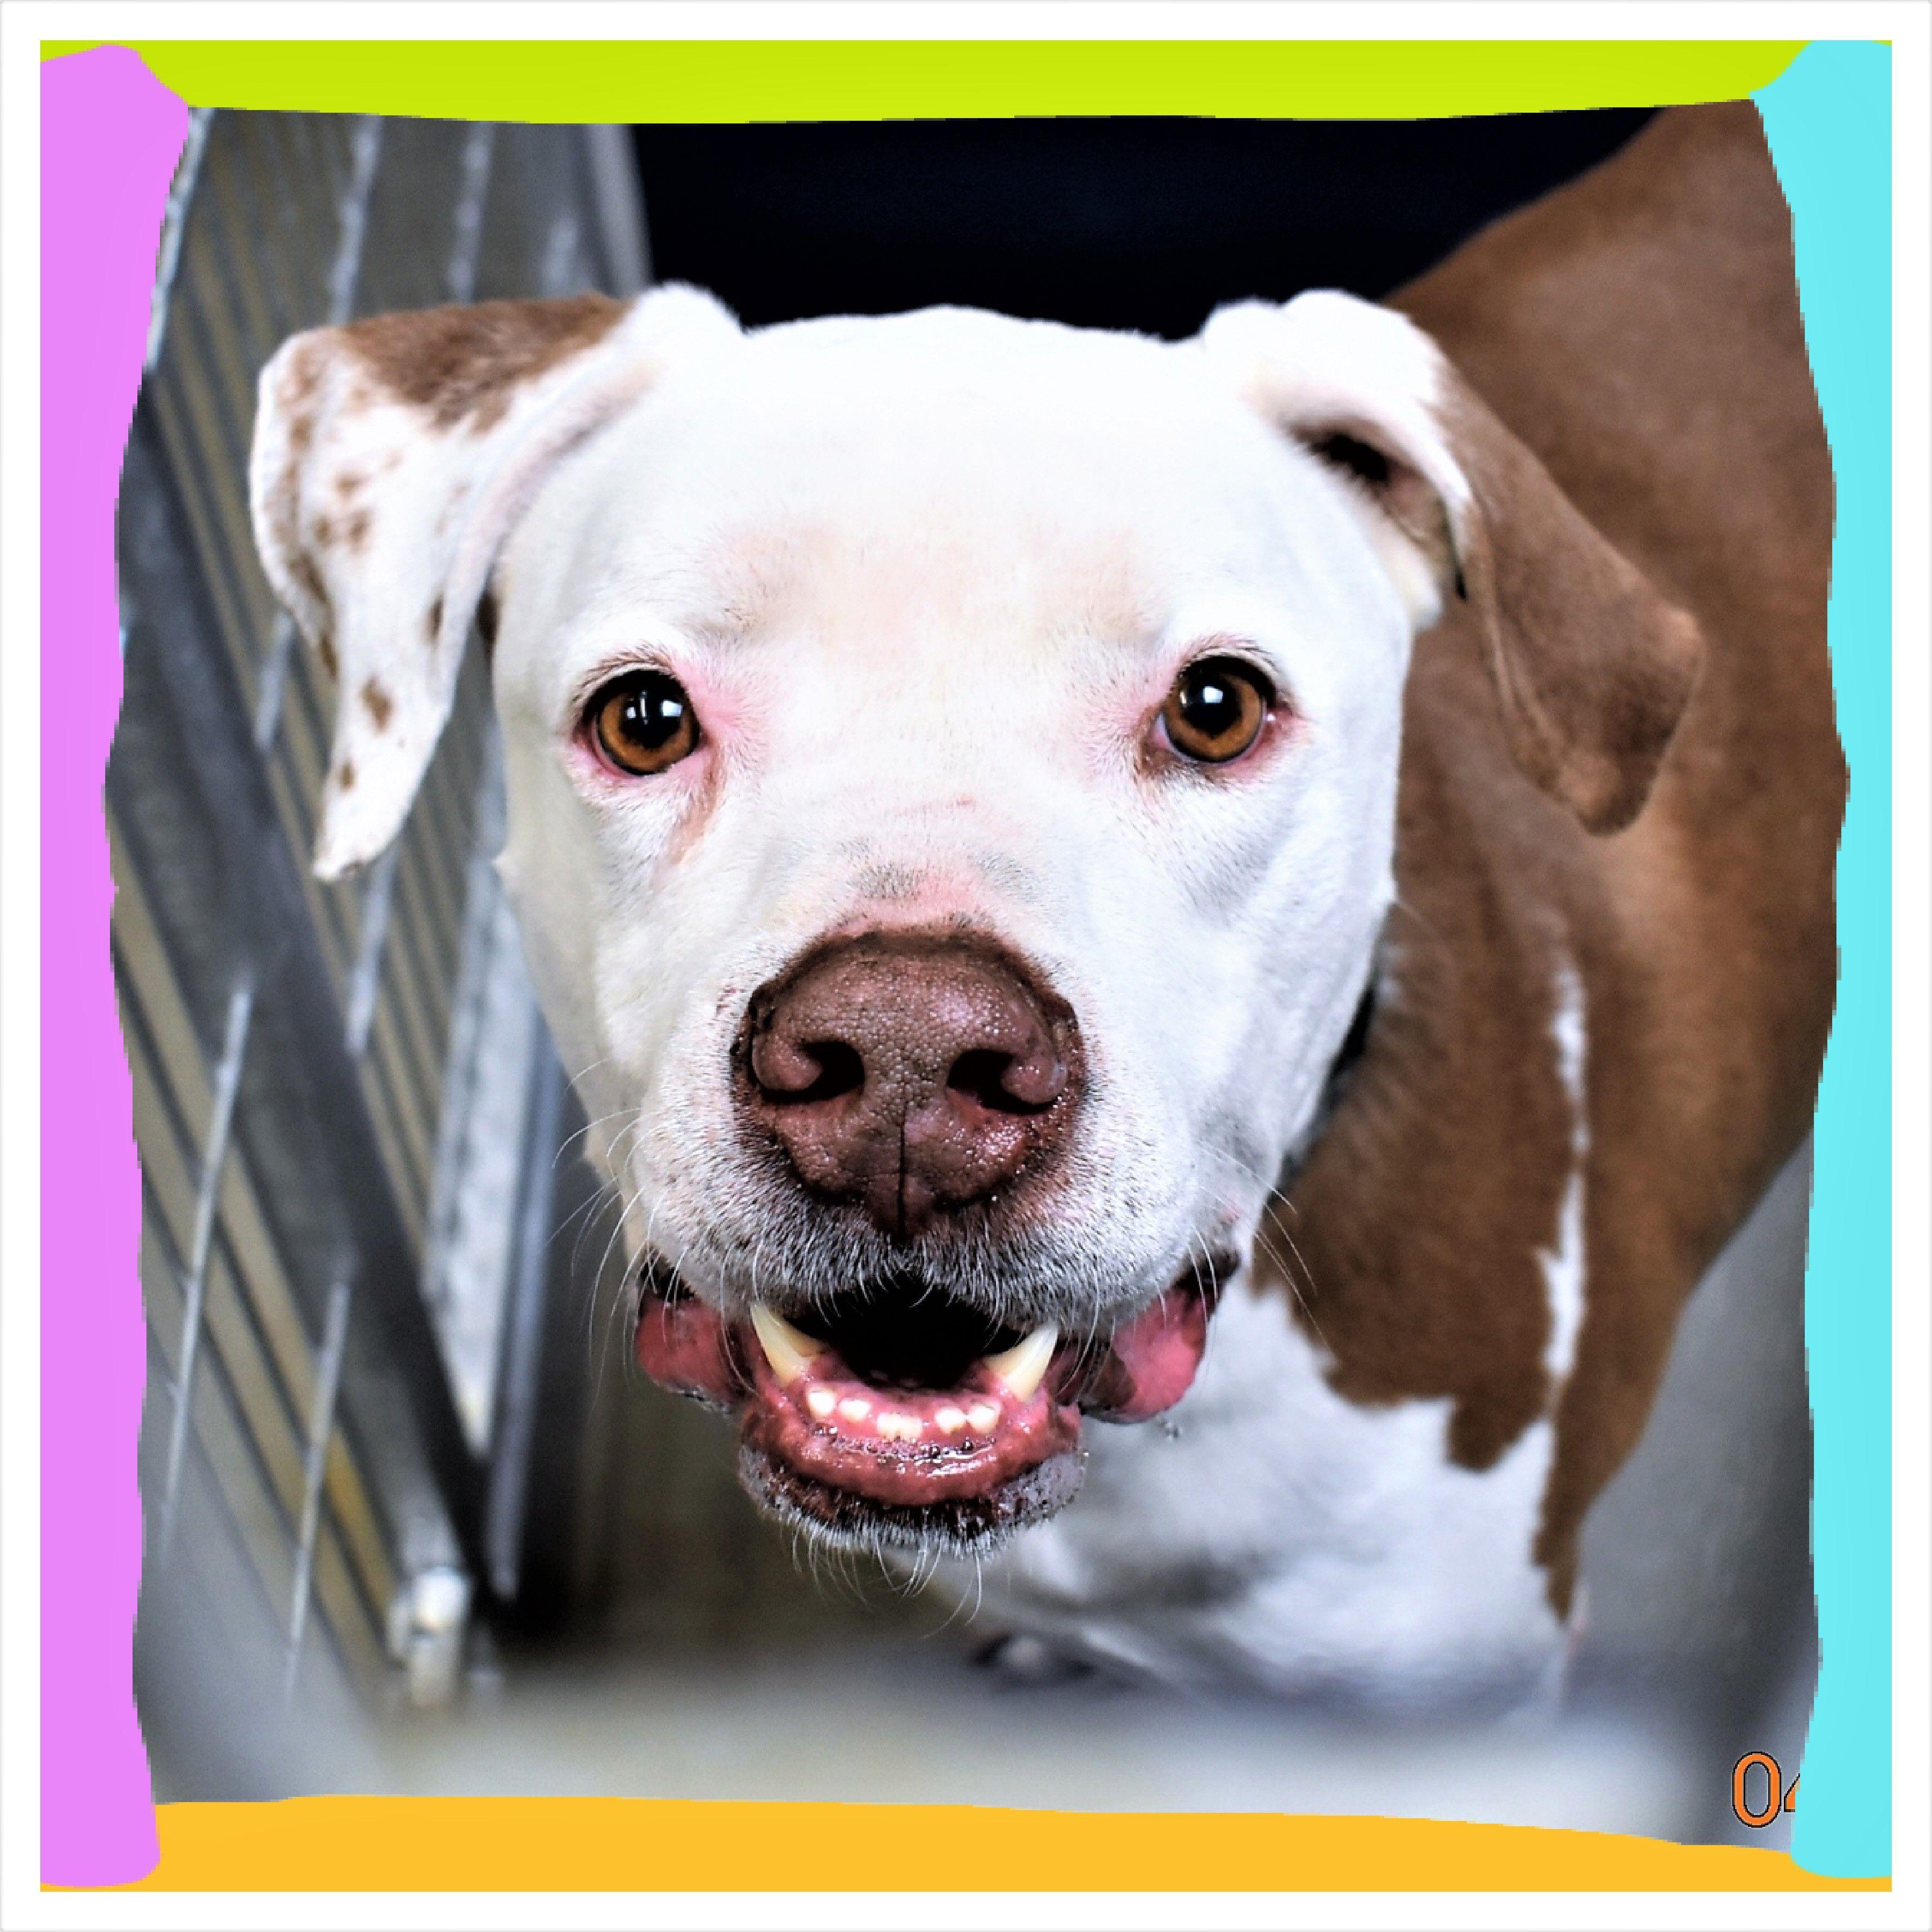 American Bulldog dog for Adoption in San Jacinto, CA. ADN